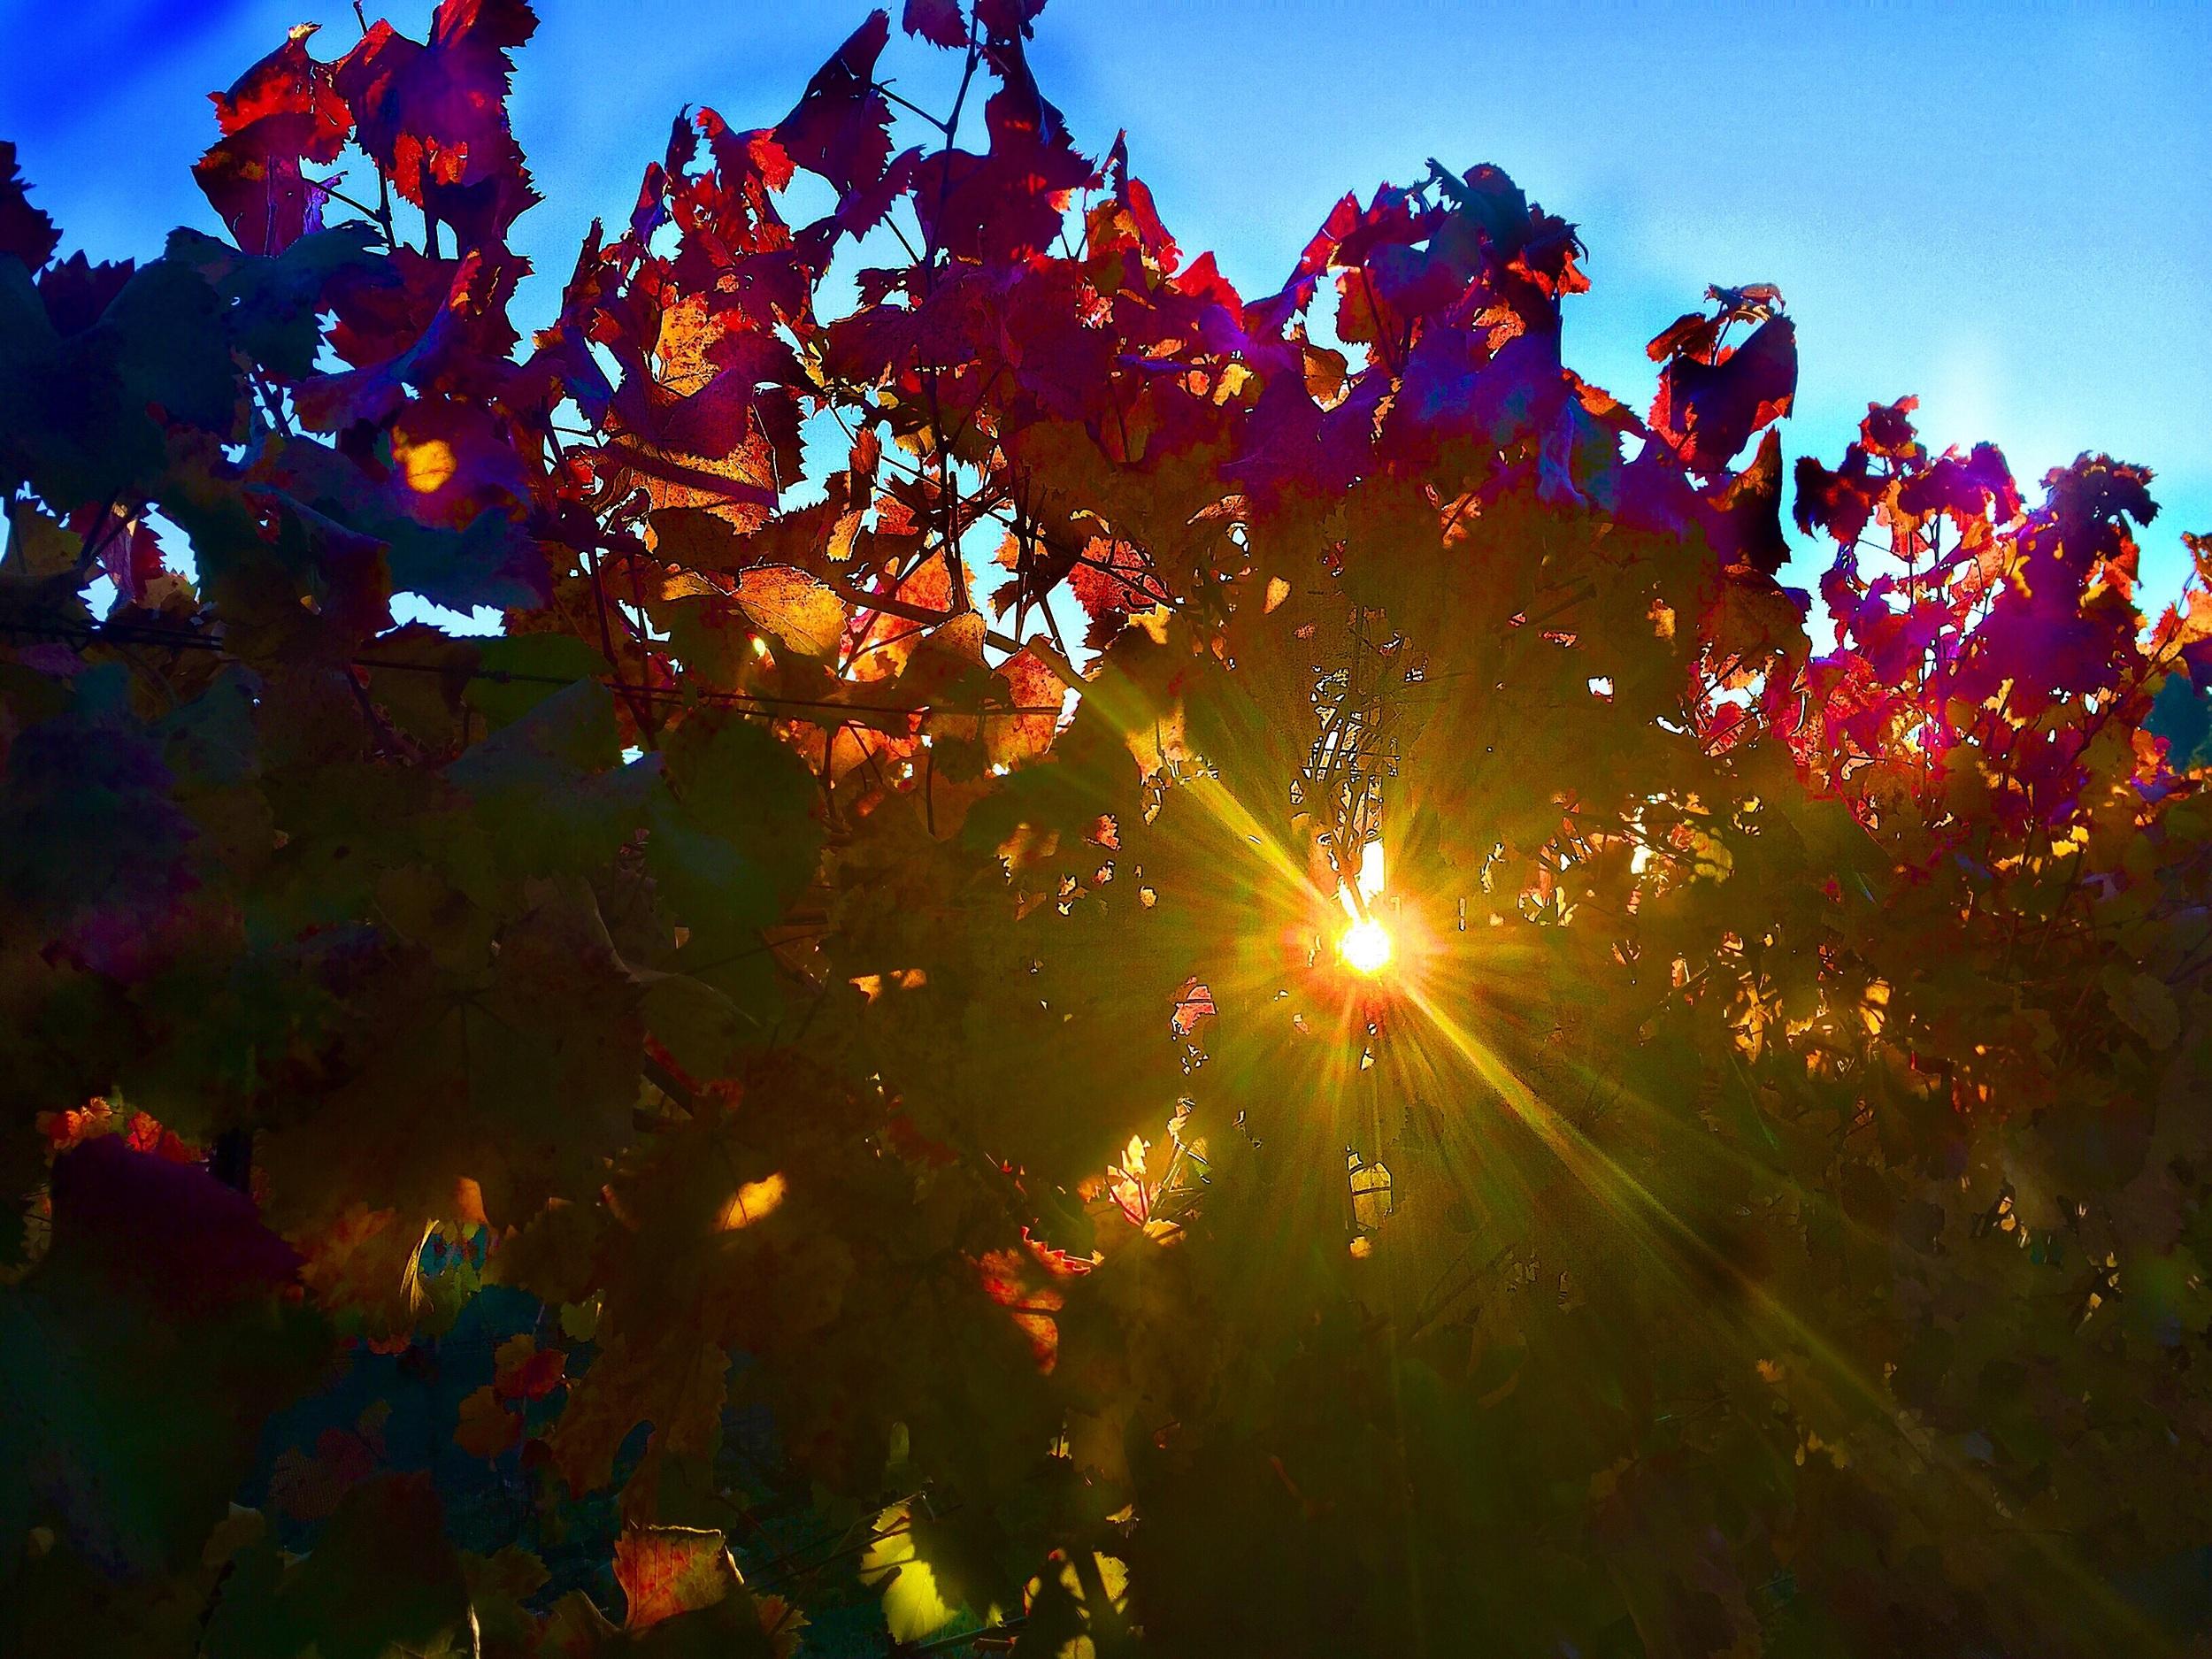 Napa Valley Cabernet Sauvignon vineyard just before Thanksgiving Yountville AVA